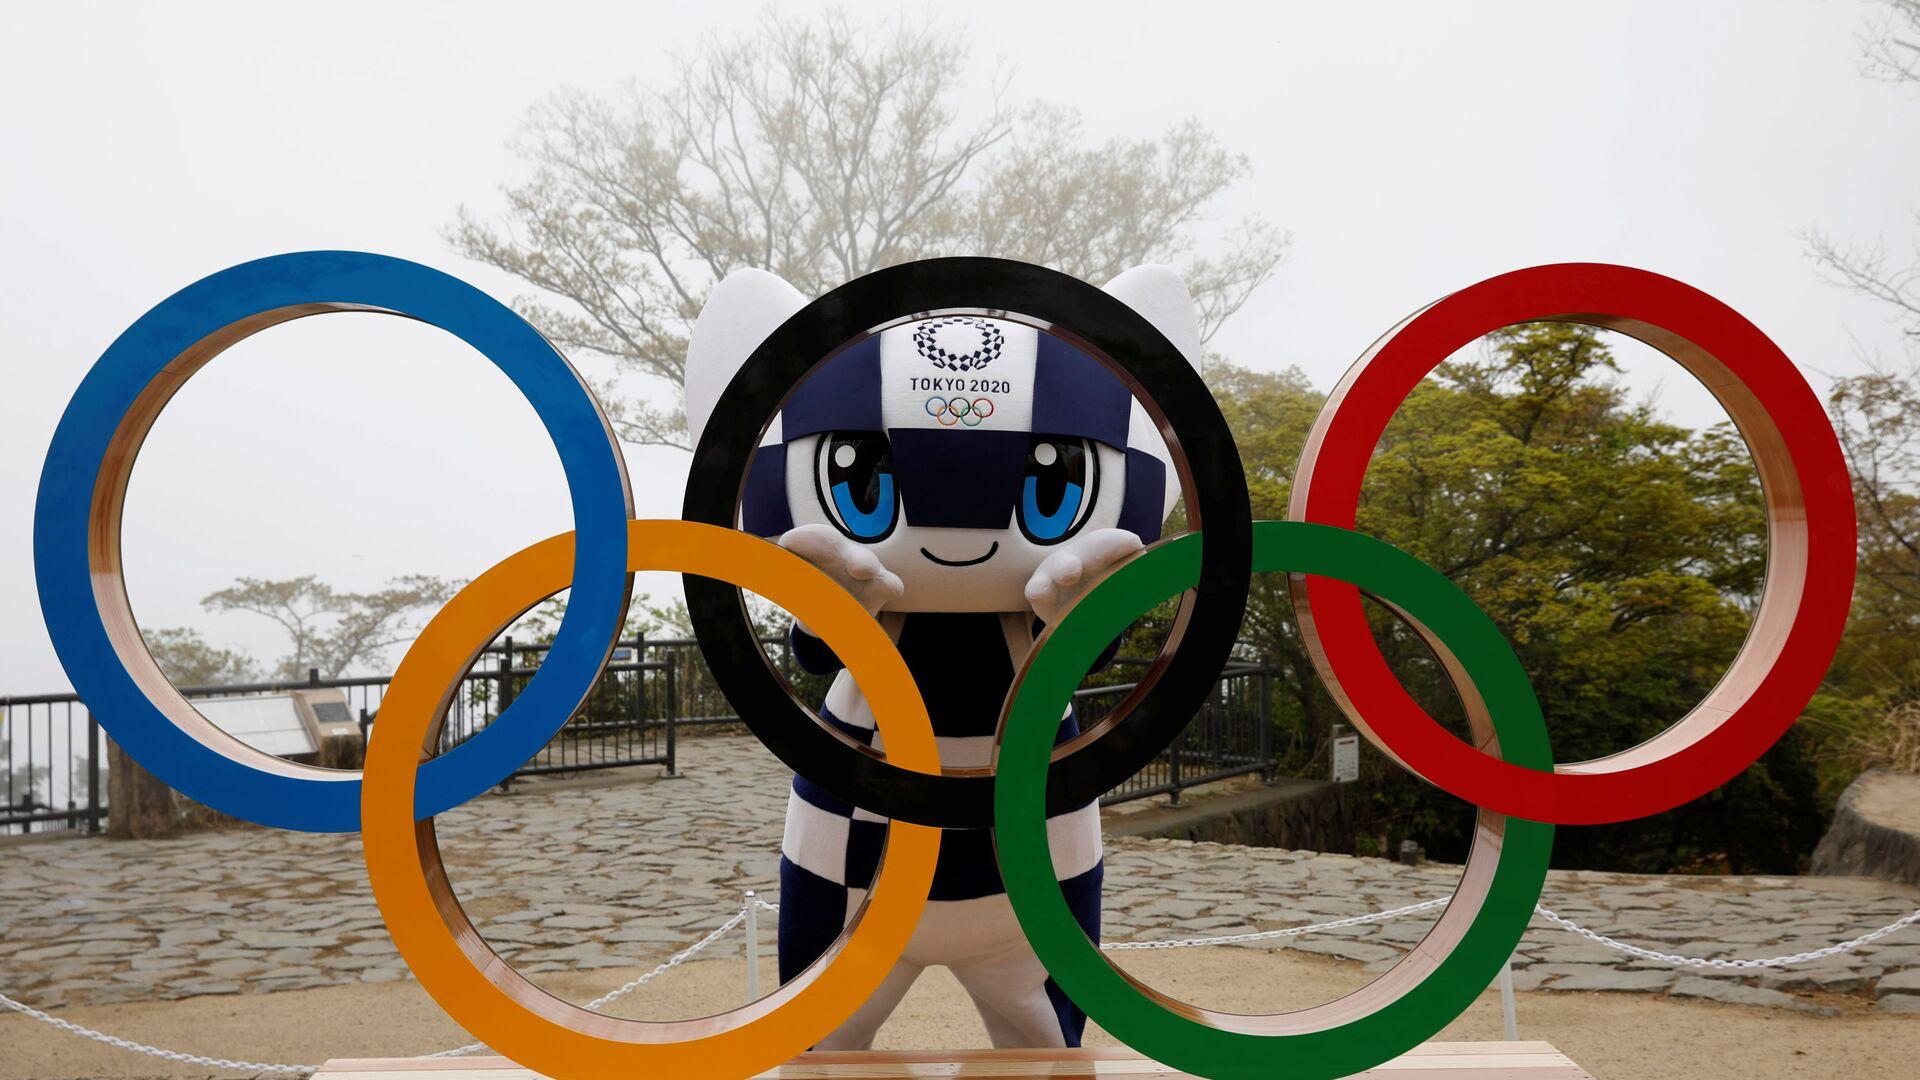 Олимпийские кольца и талисман Олимпиады-2020 в Токио - Sputnik Латвия, 1920, 19.07.2021